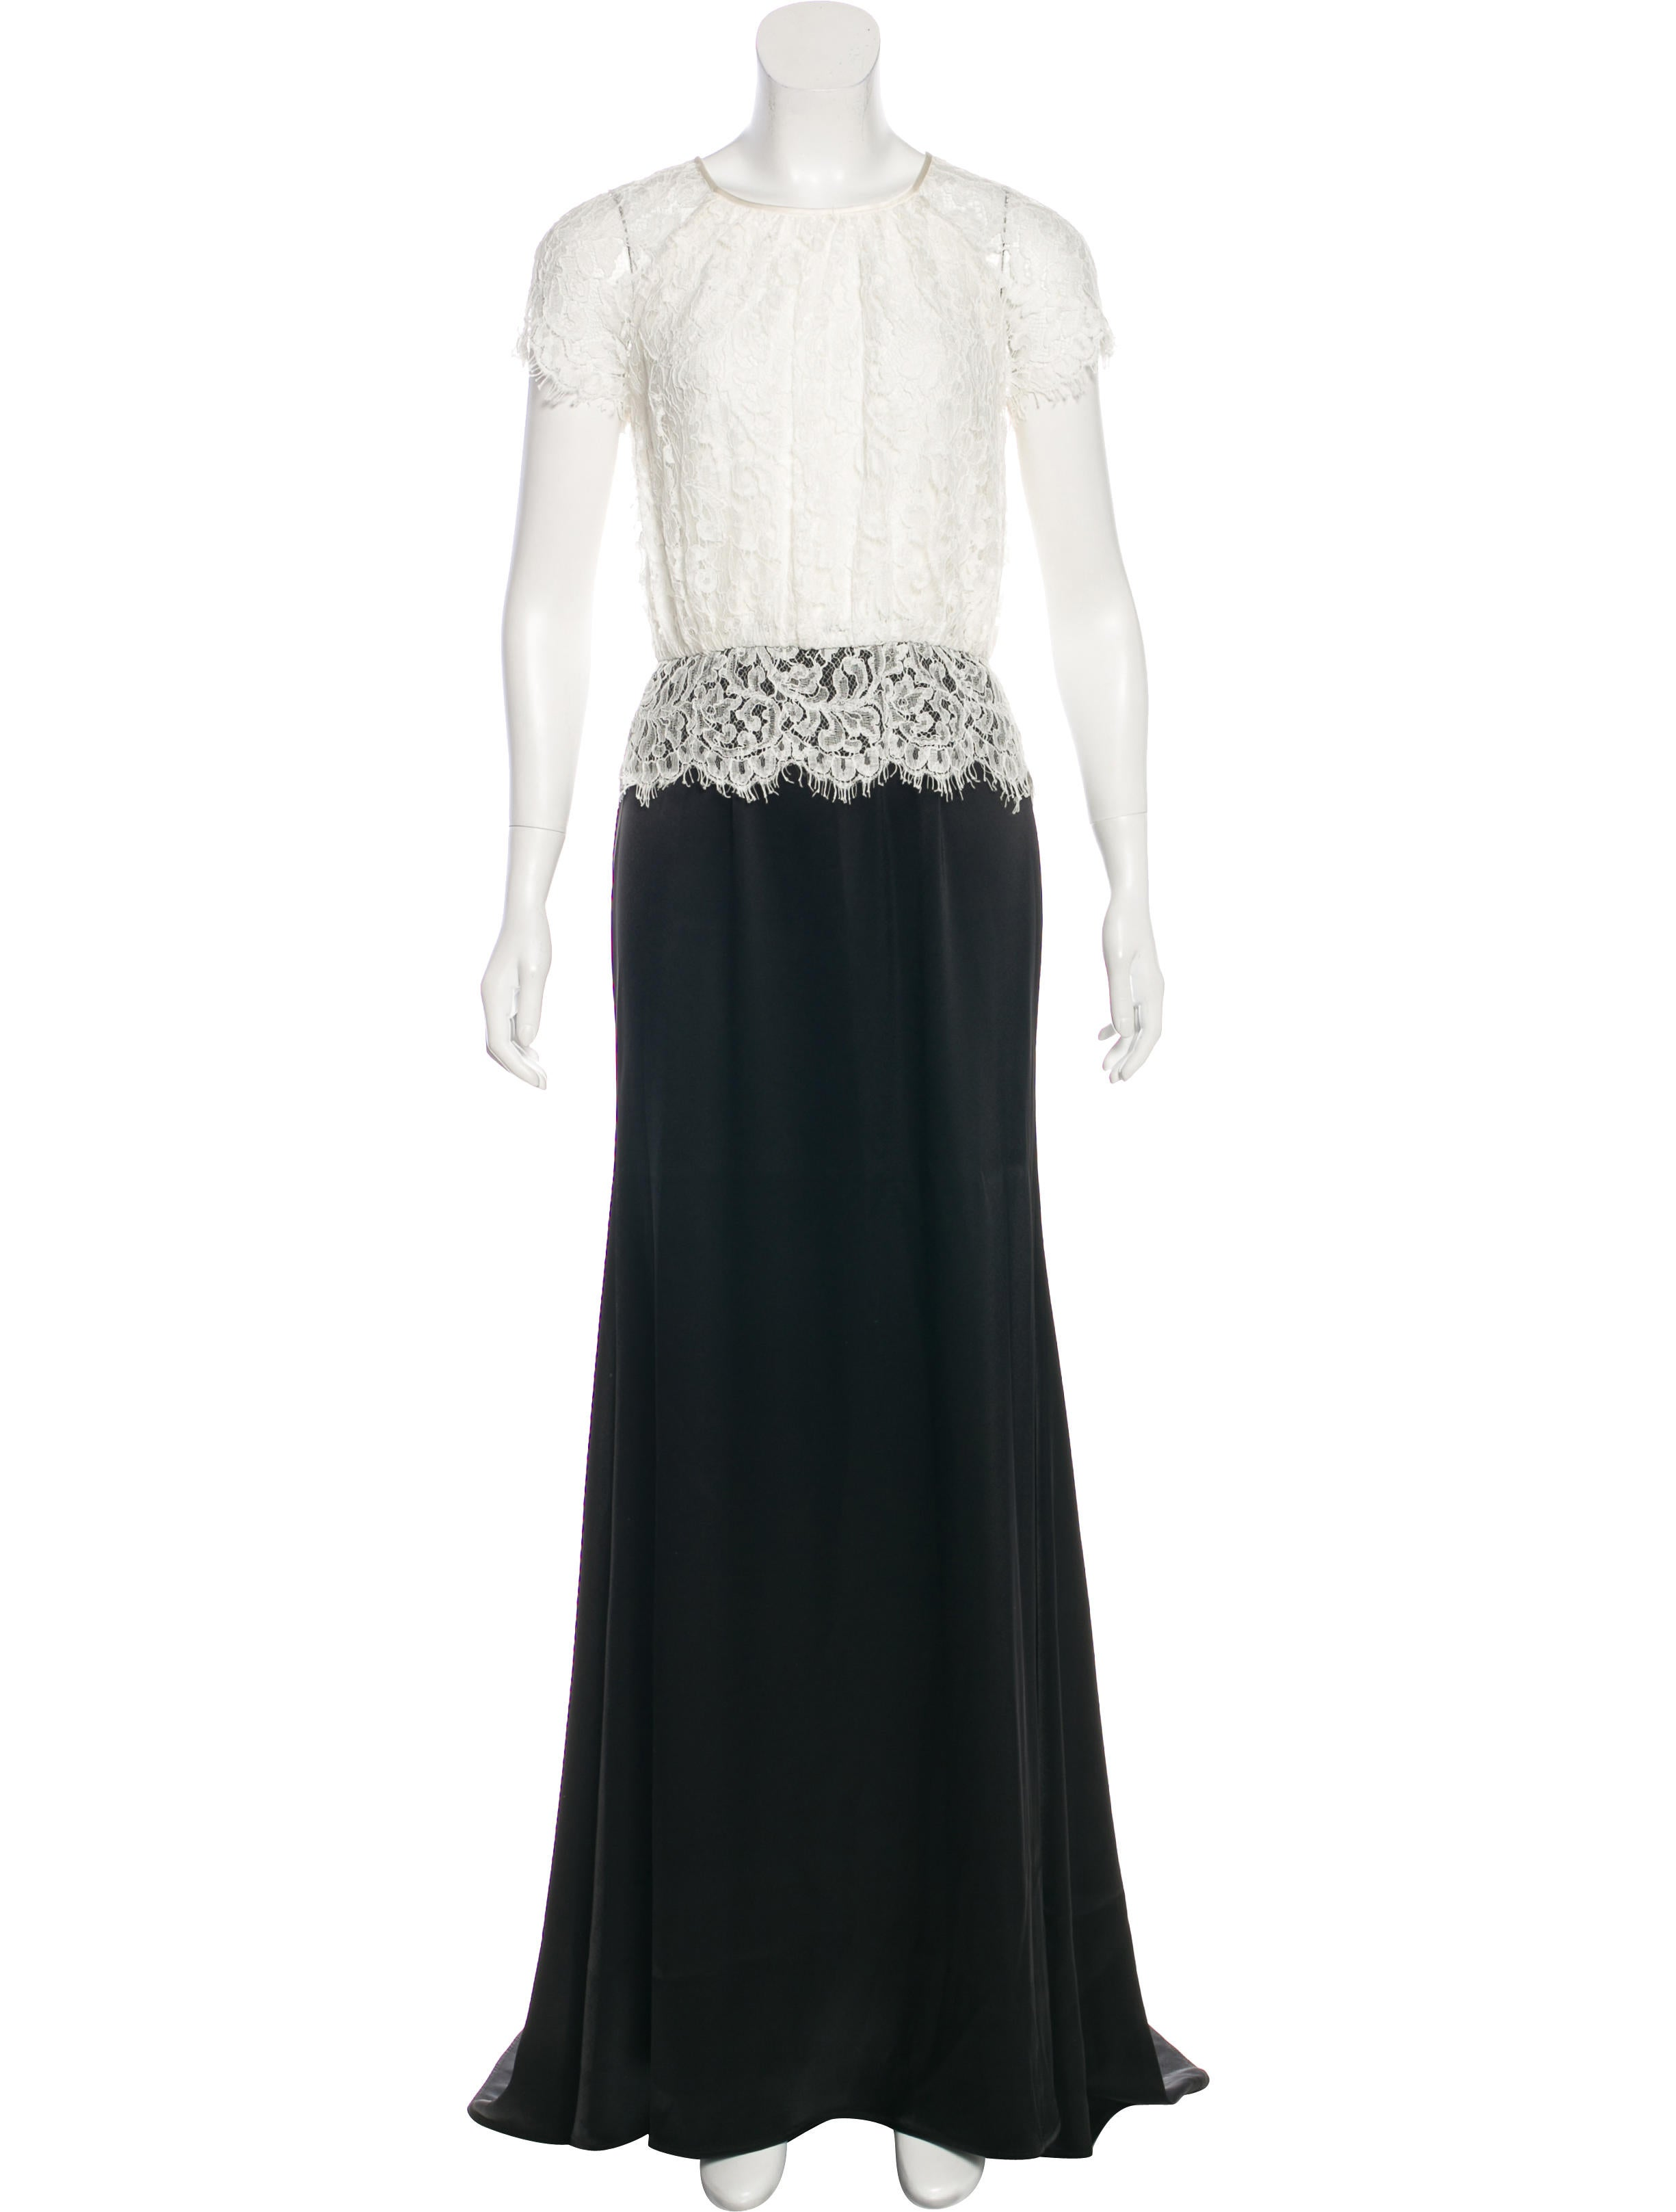 St. John Lace Evening Dress - Clothing - STJ25360   The RealReal